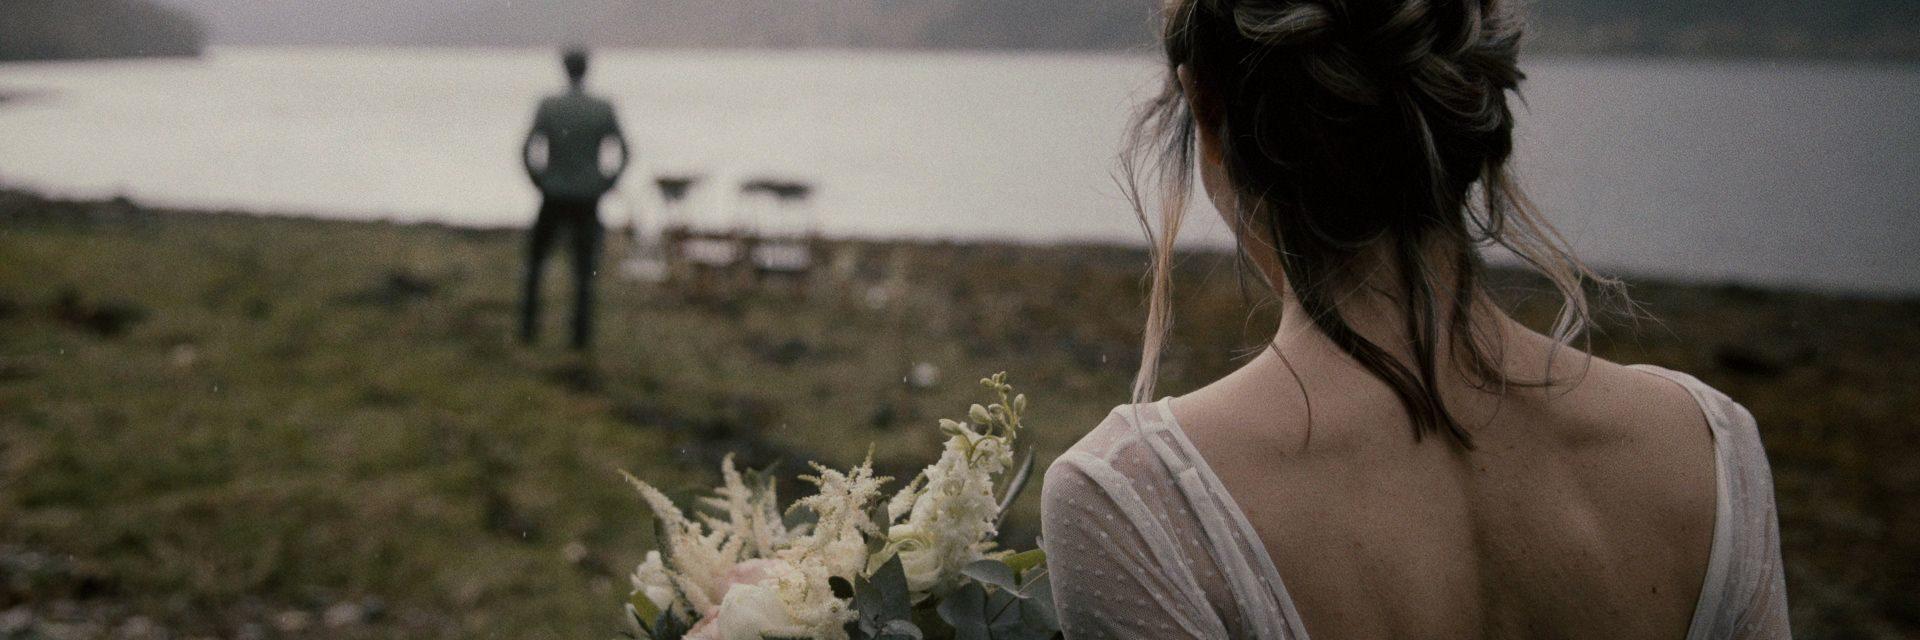 Rabat-wedding-videographer-cinemate-films-02